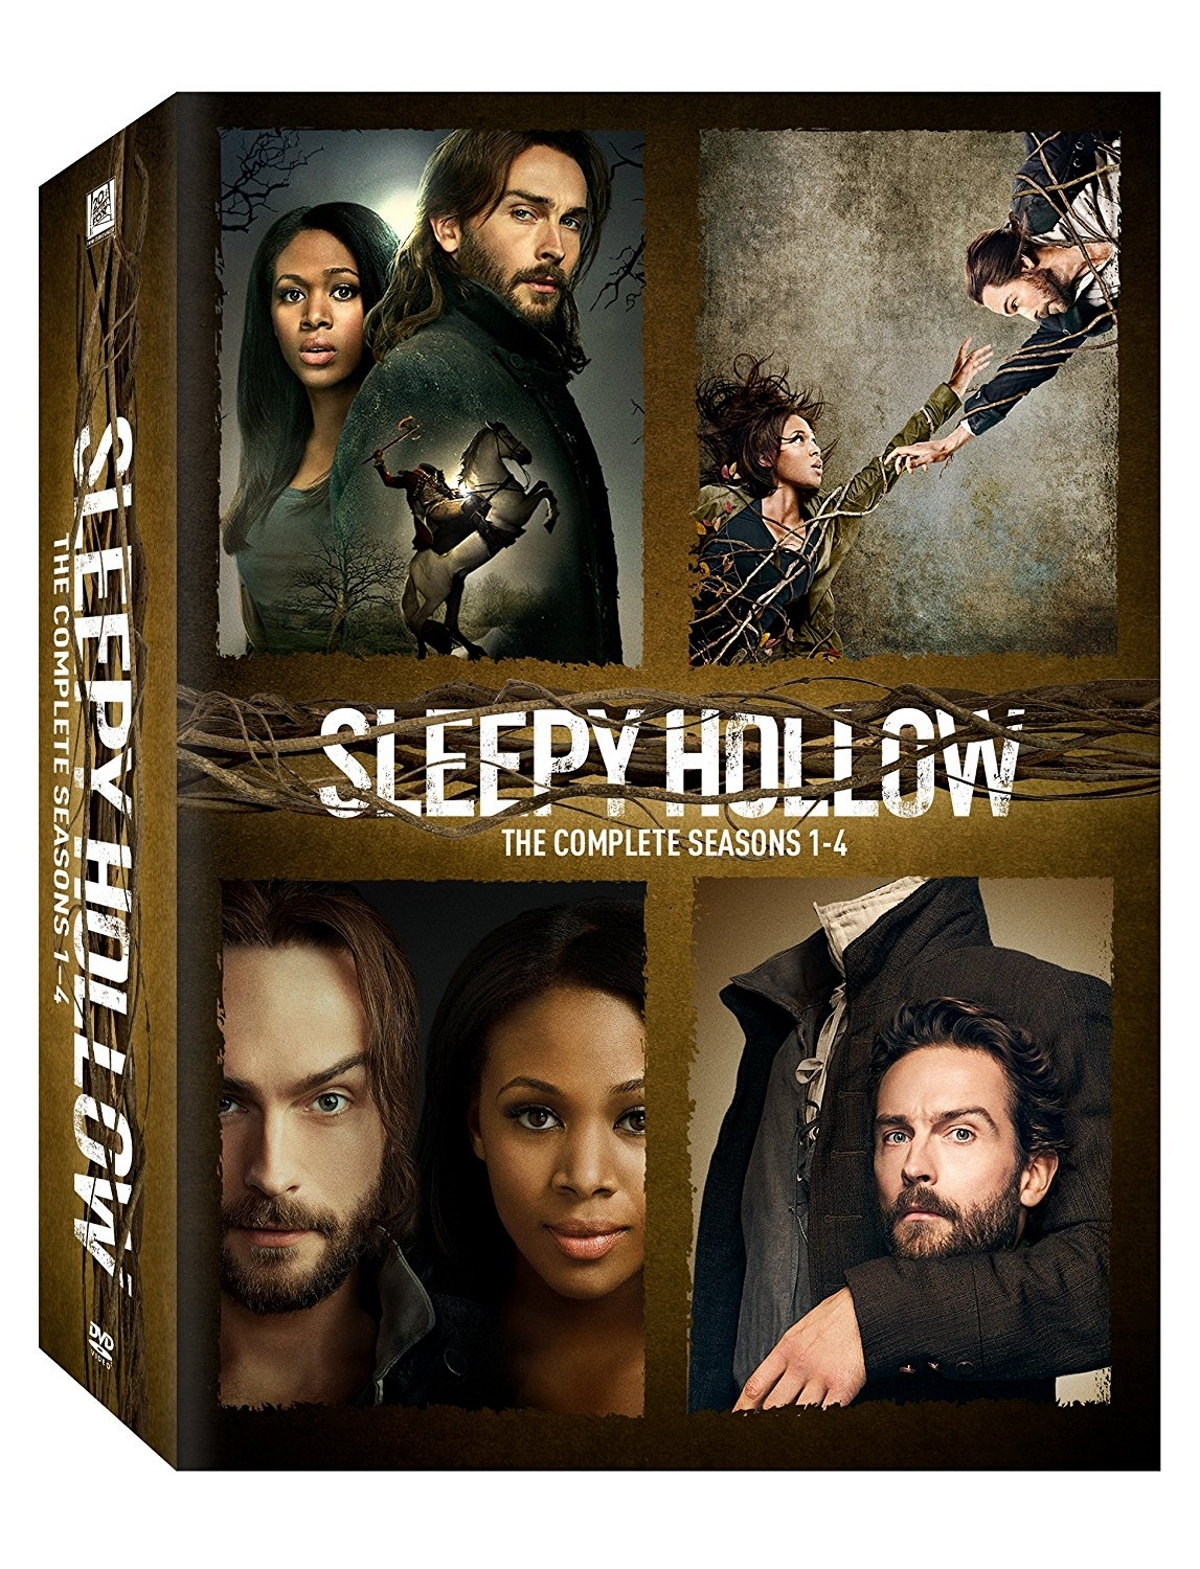 Sleepy hollow the complete series seasons 1 4  dvd 2017 18 disc boxset  1 2 3 4